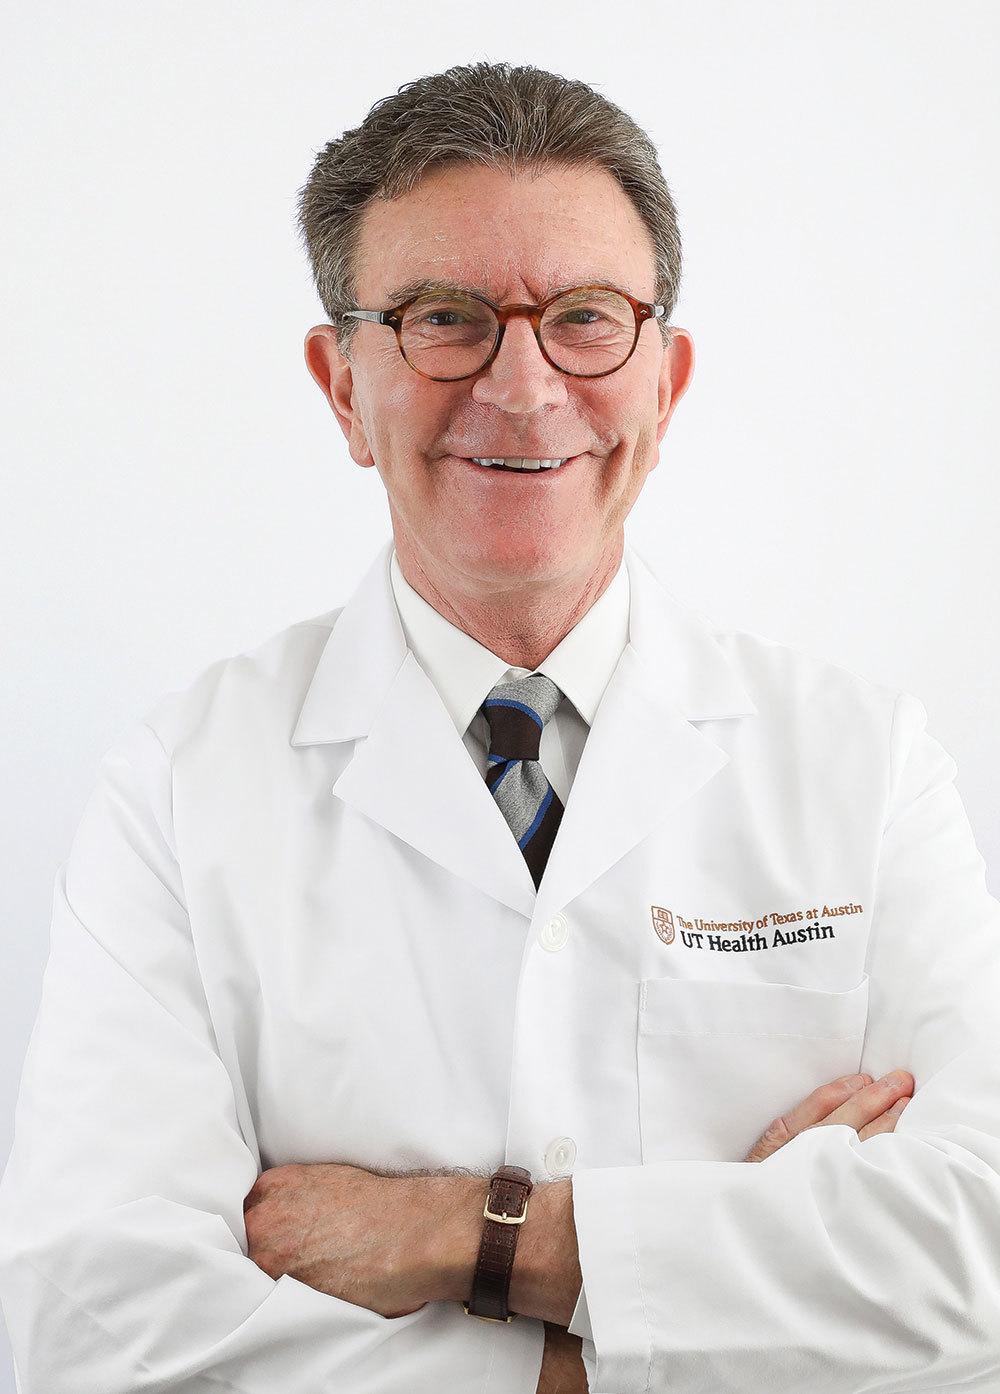 Ed Bernacki at UT Health Austin